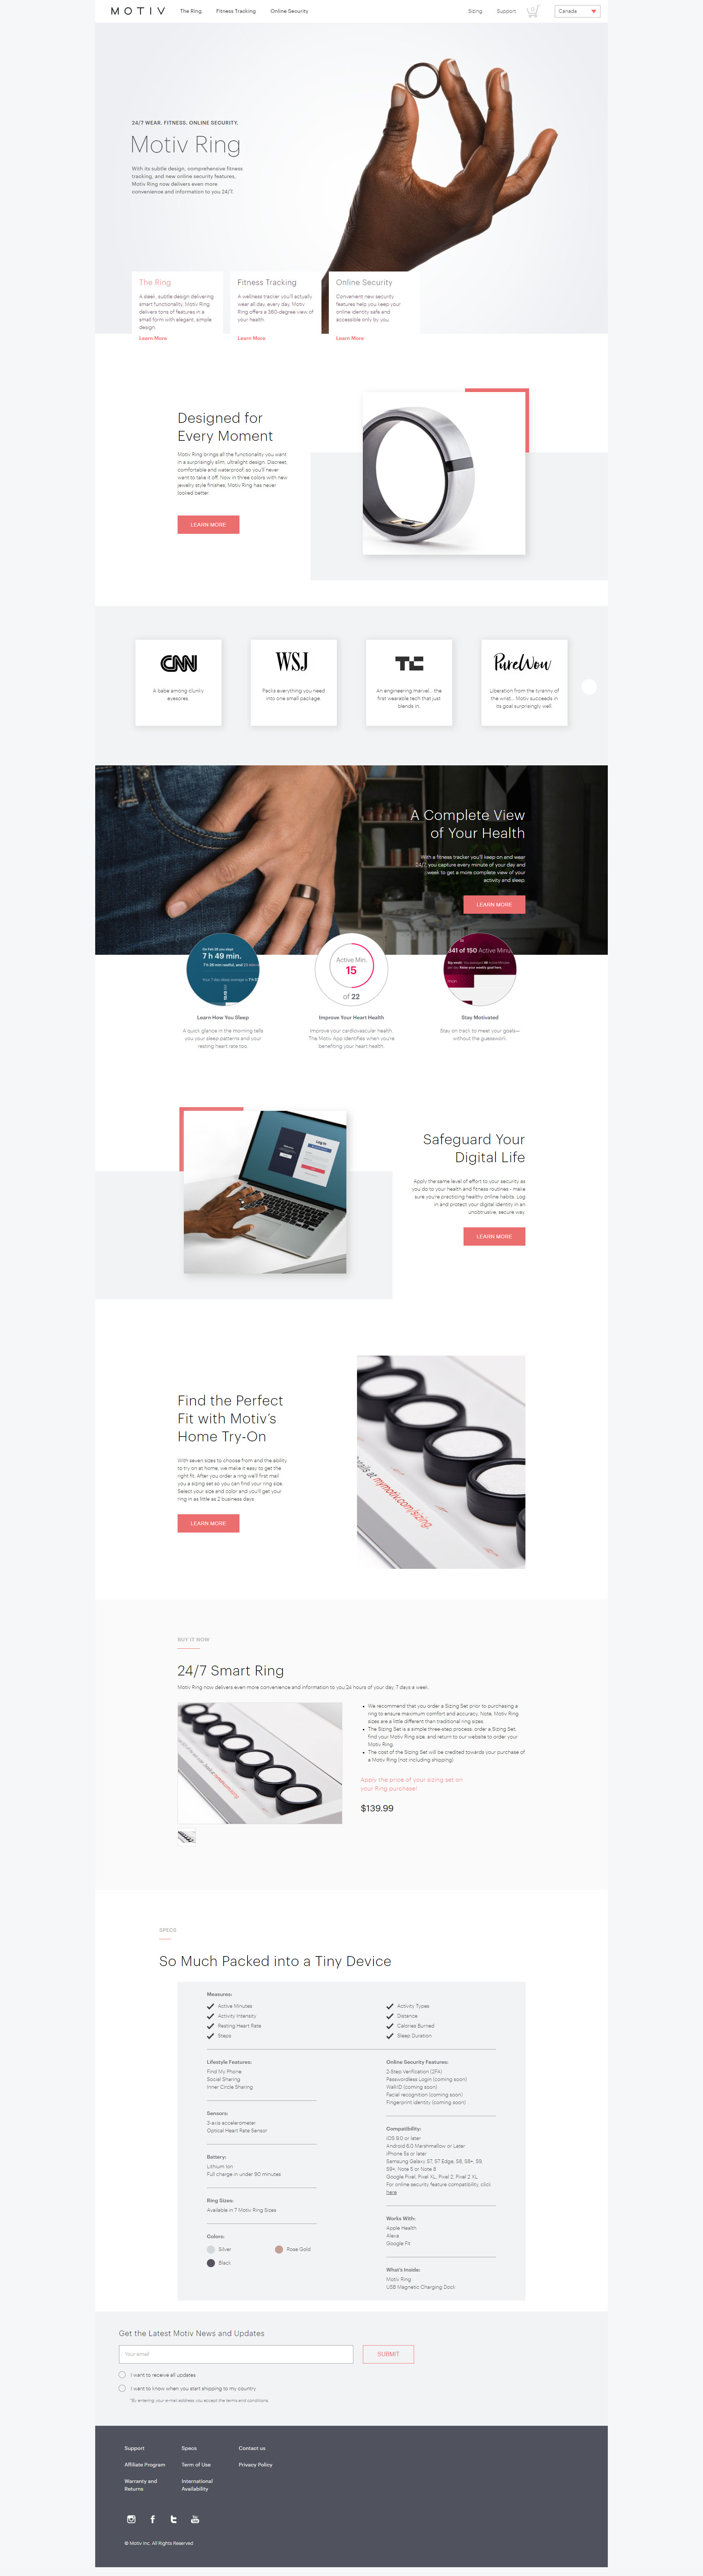 Previous Health Technology Website Design Example